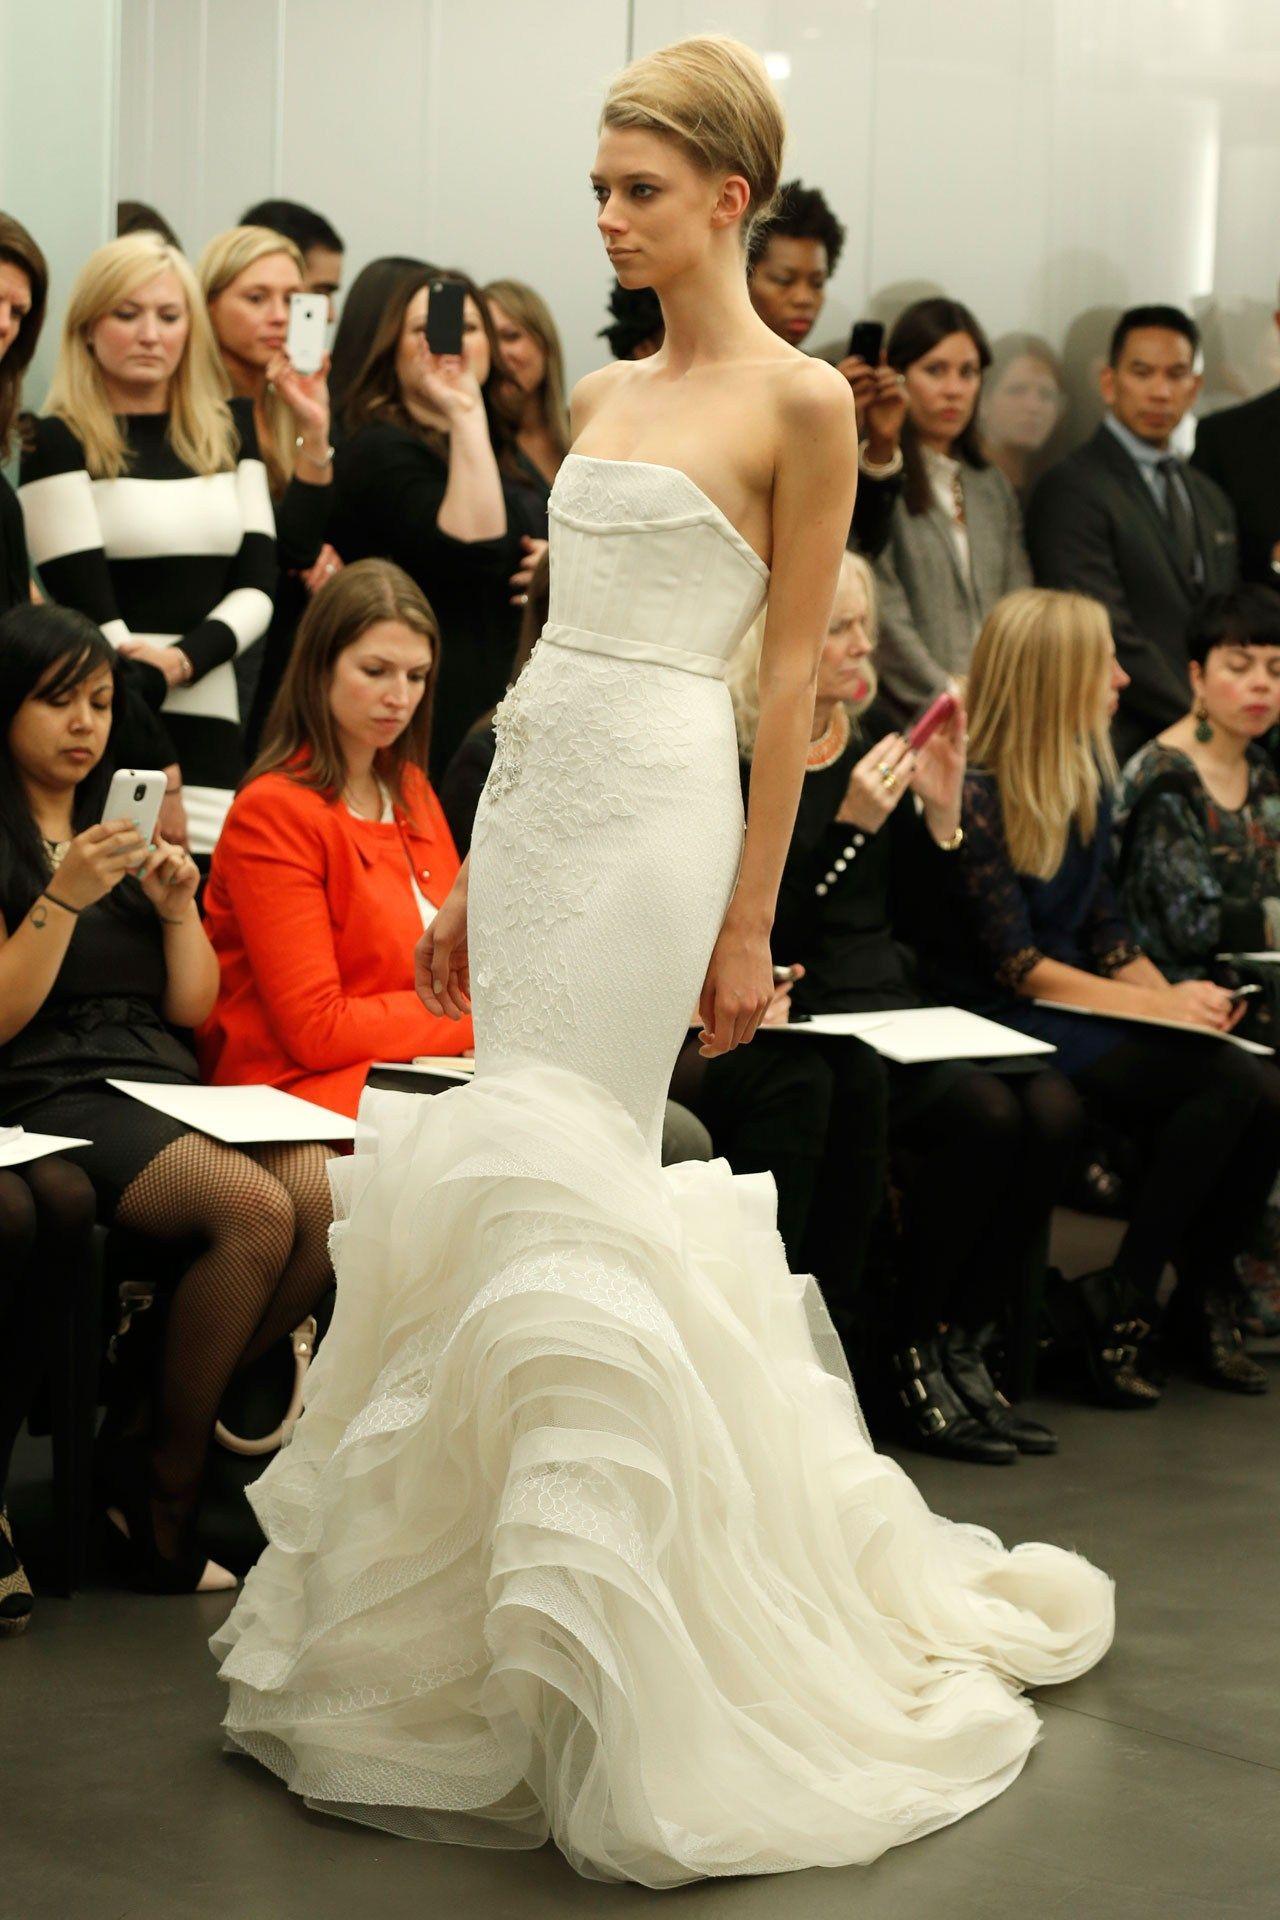 Bridal wedding dresses  Wedding Dresses  The Ultimate Gallery BridesMagazine  Vera